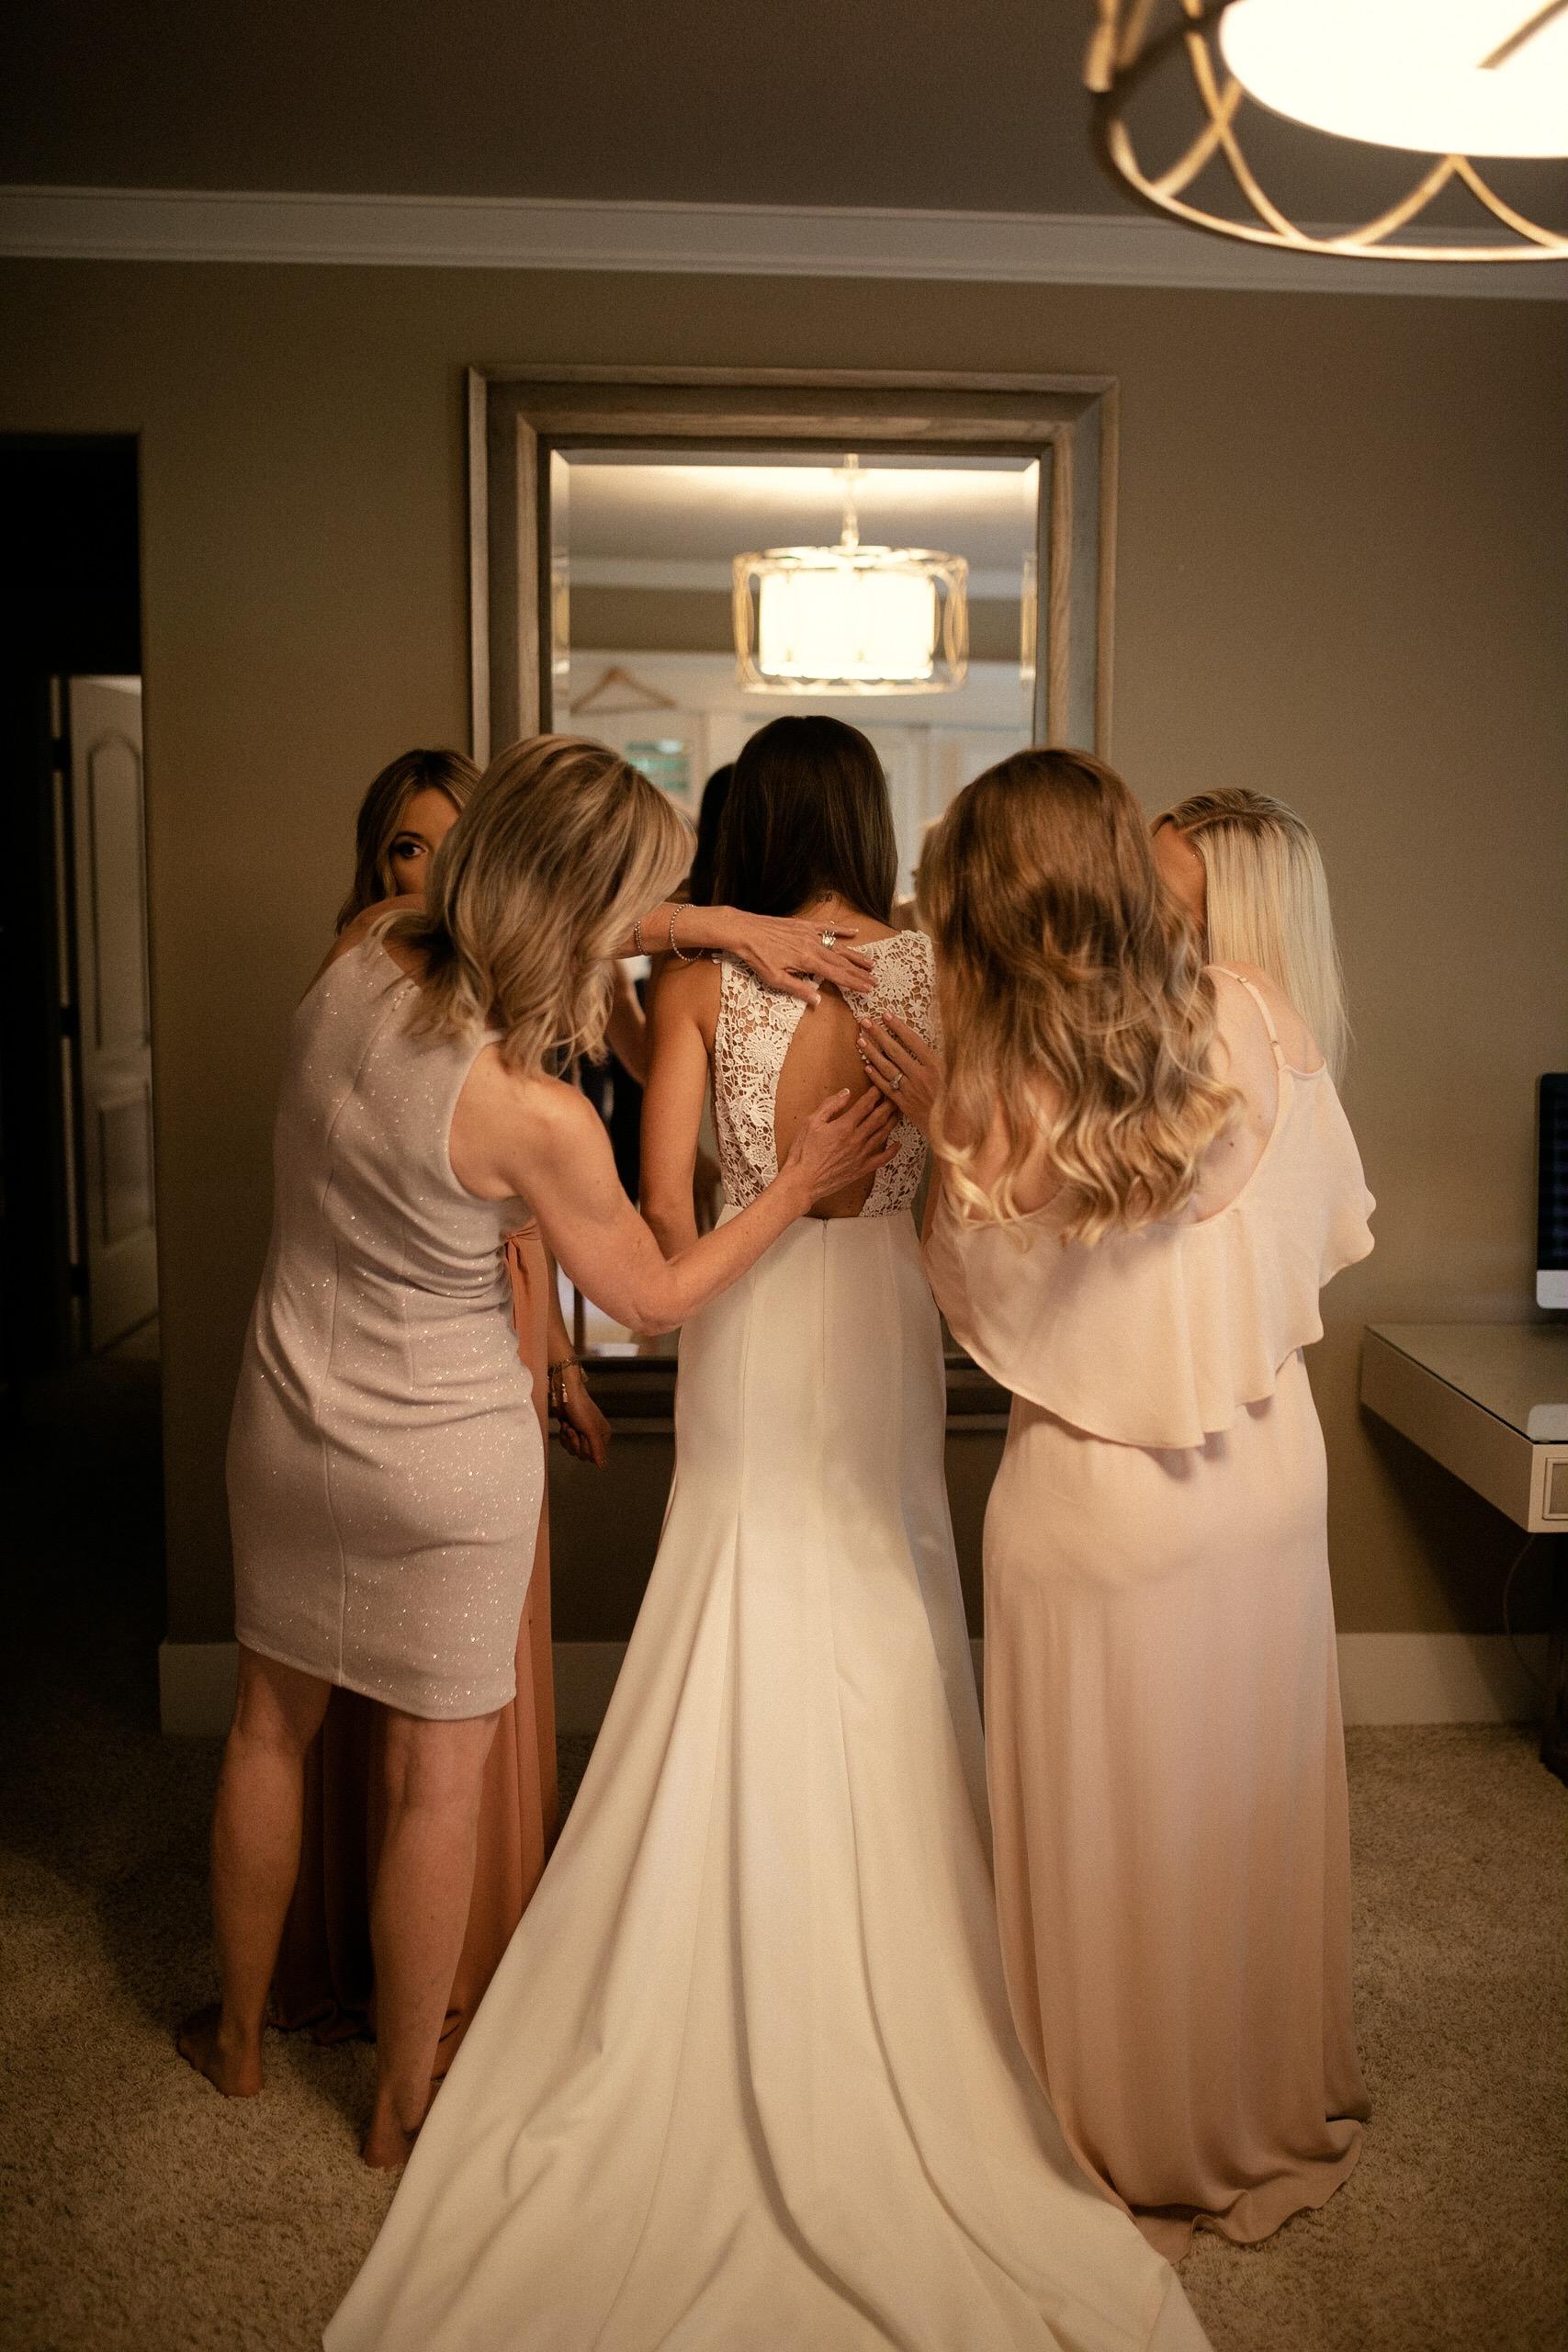 Bride and sisters' dress shot Sarah Seven wedding dress